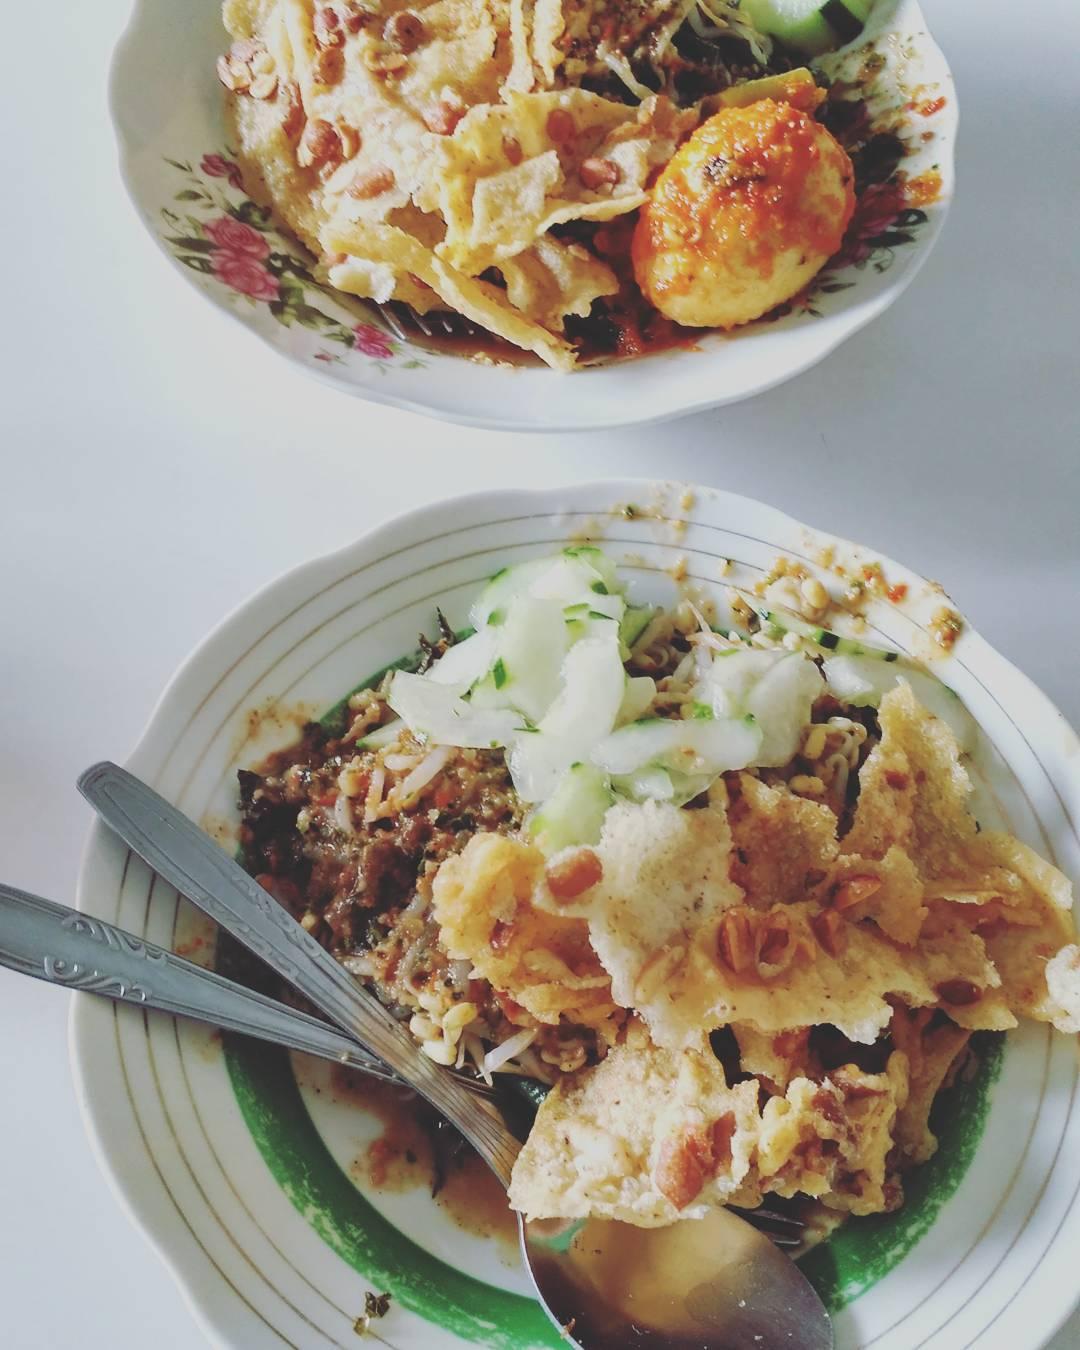 Nasi Pecel Mustika, Nasi Pecel Mustika Malang, Malang, Kota Malang, Dolan Dolen, Dolaners Nasi Pecel Mustika via jatunurhidayat - Dolan Dolen